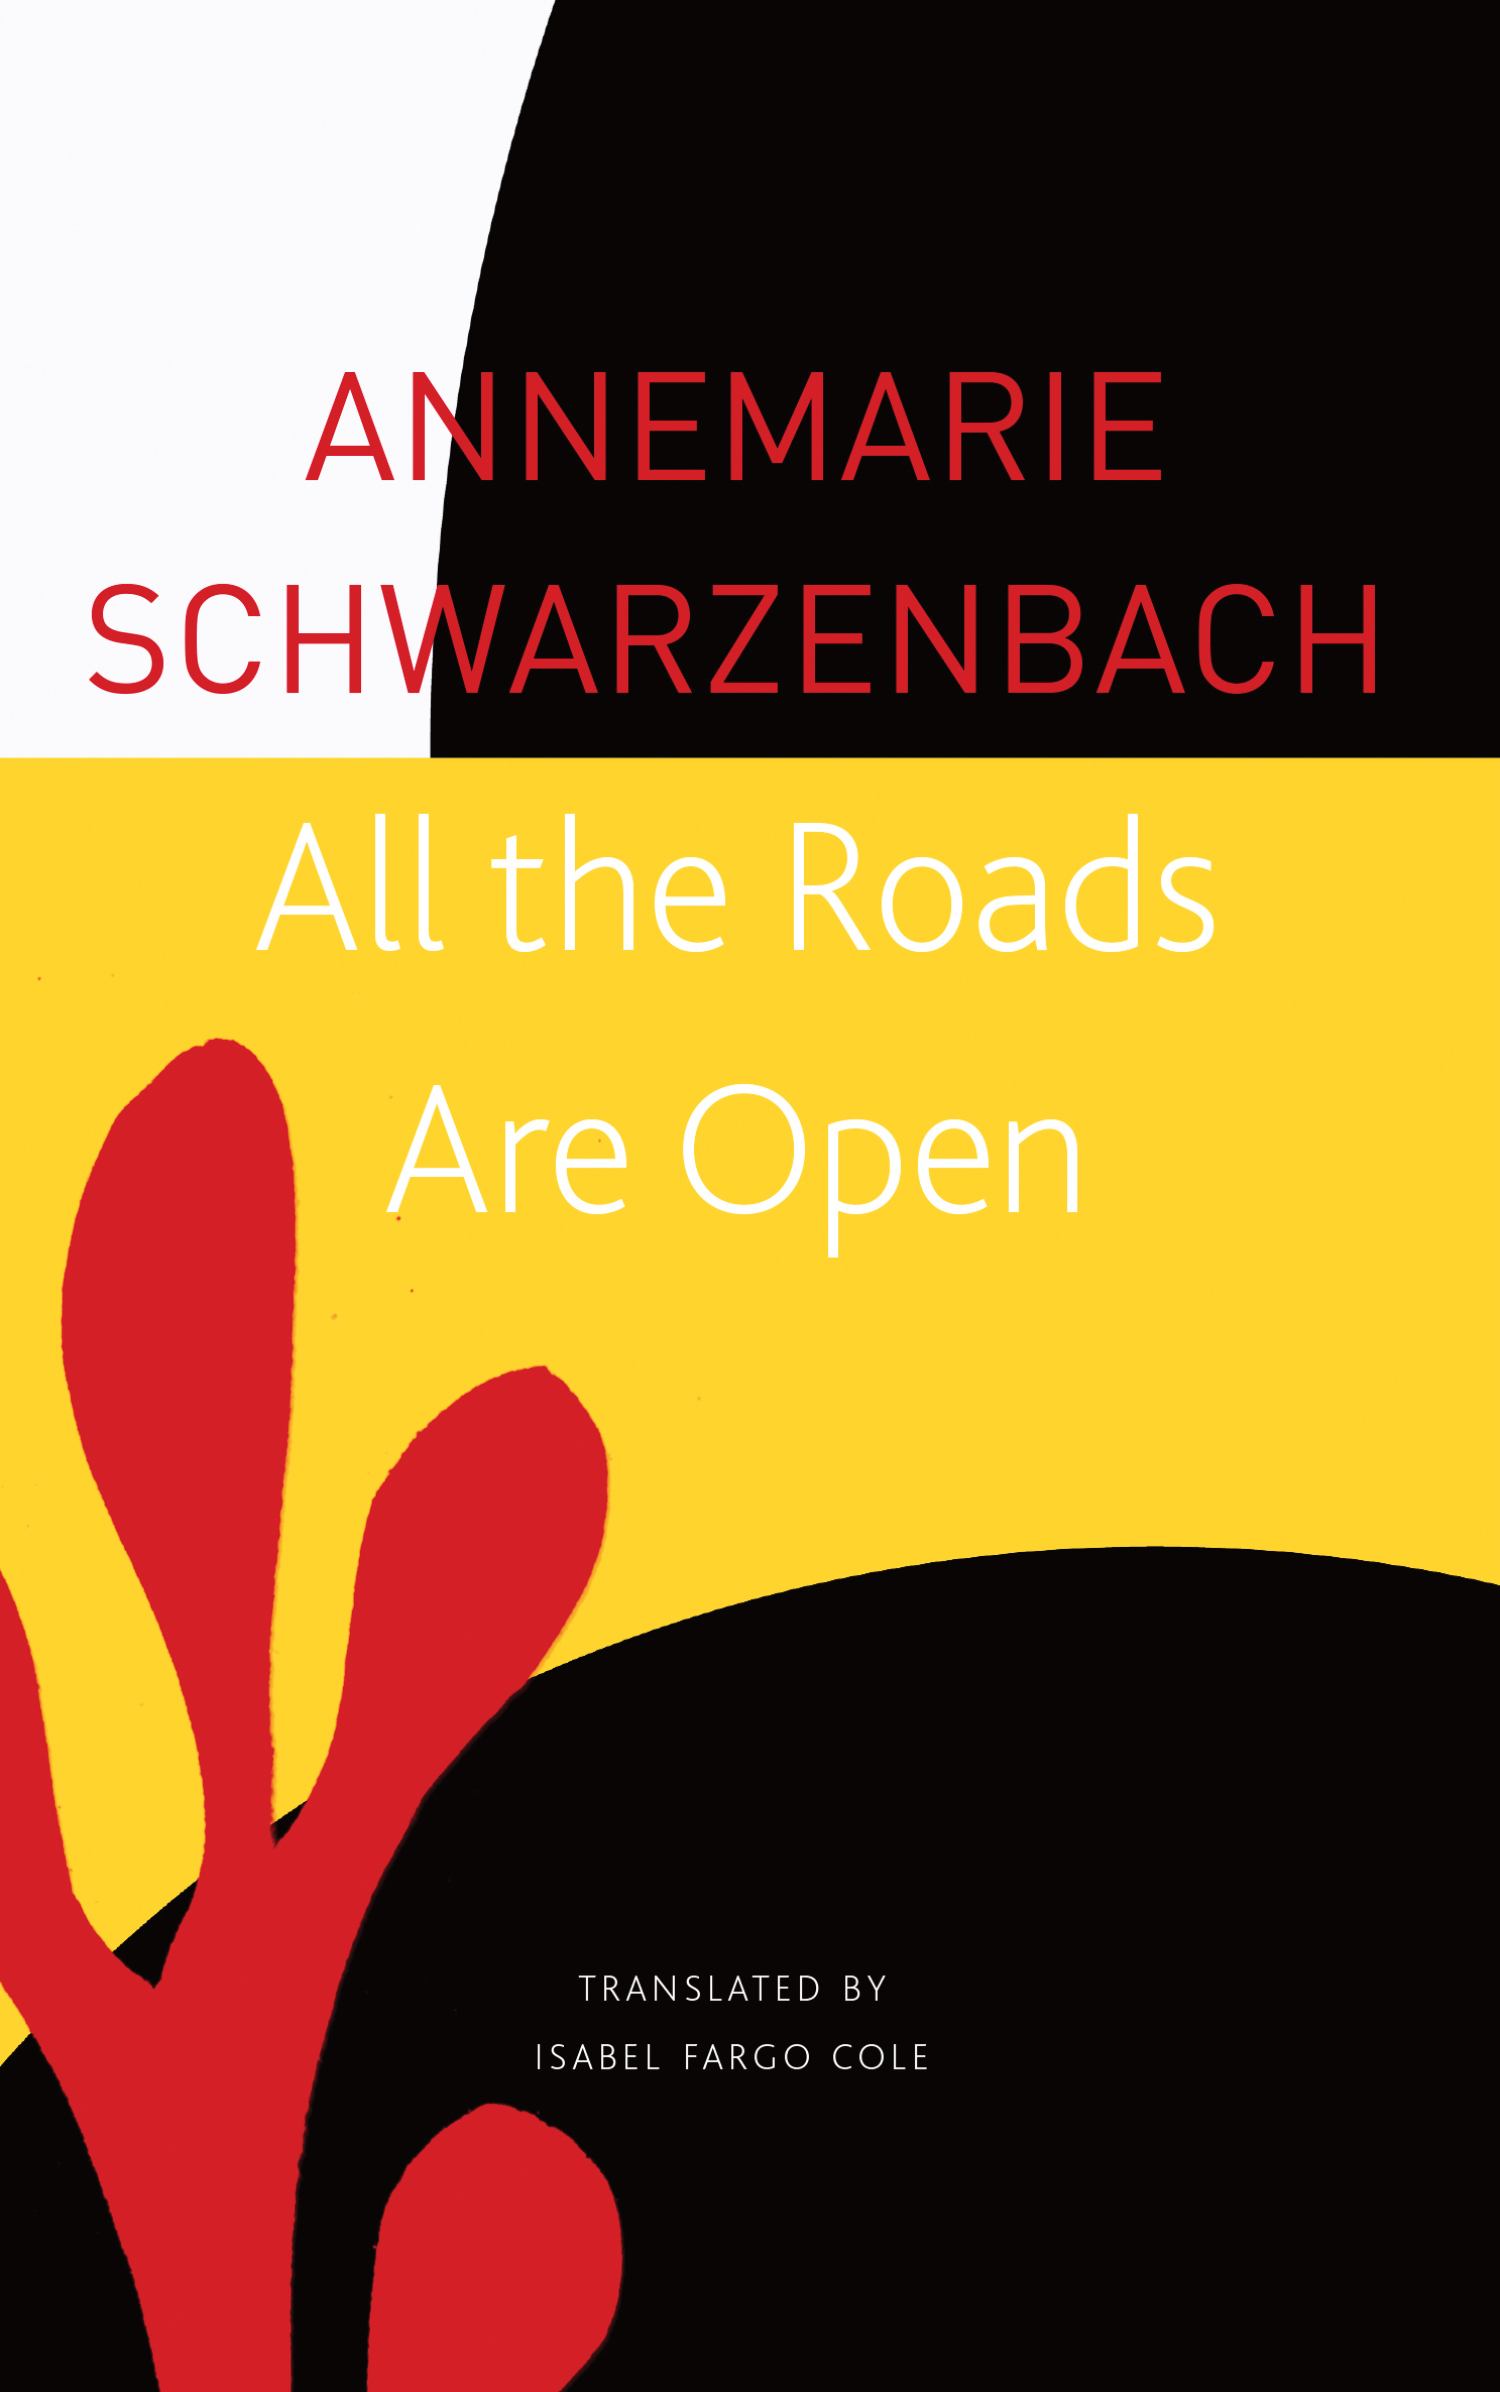 All the Roads Are Open by Annemarie Schwarzenbach   Seagull Books